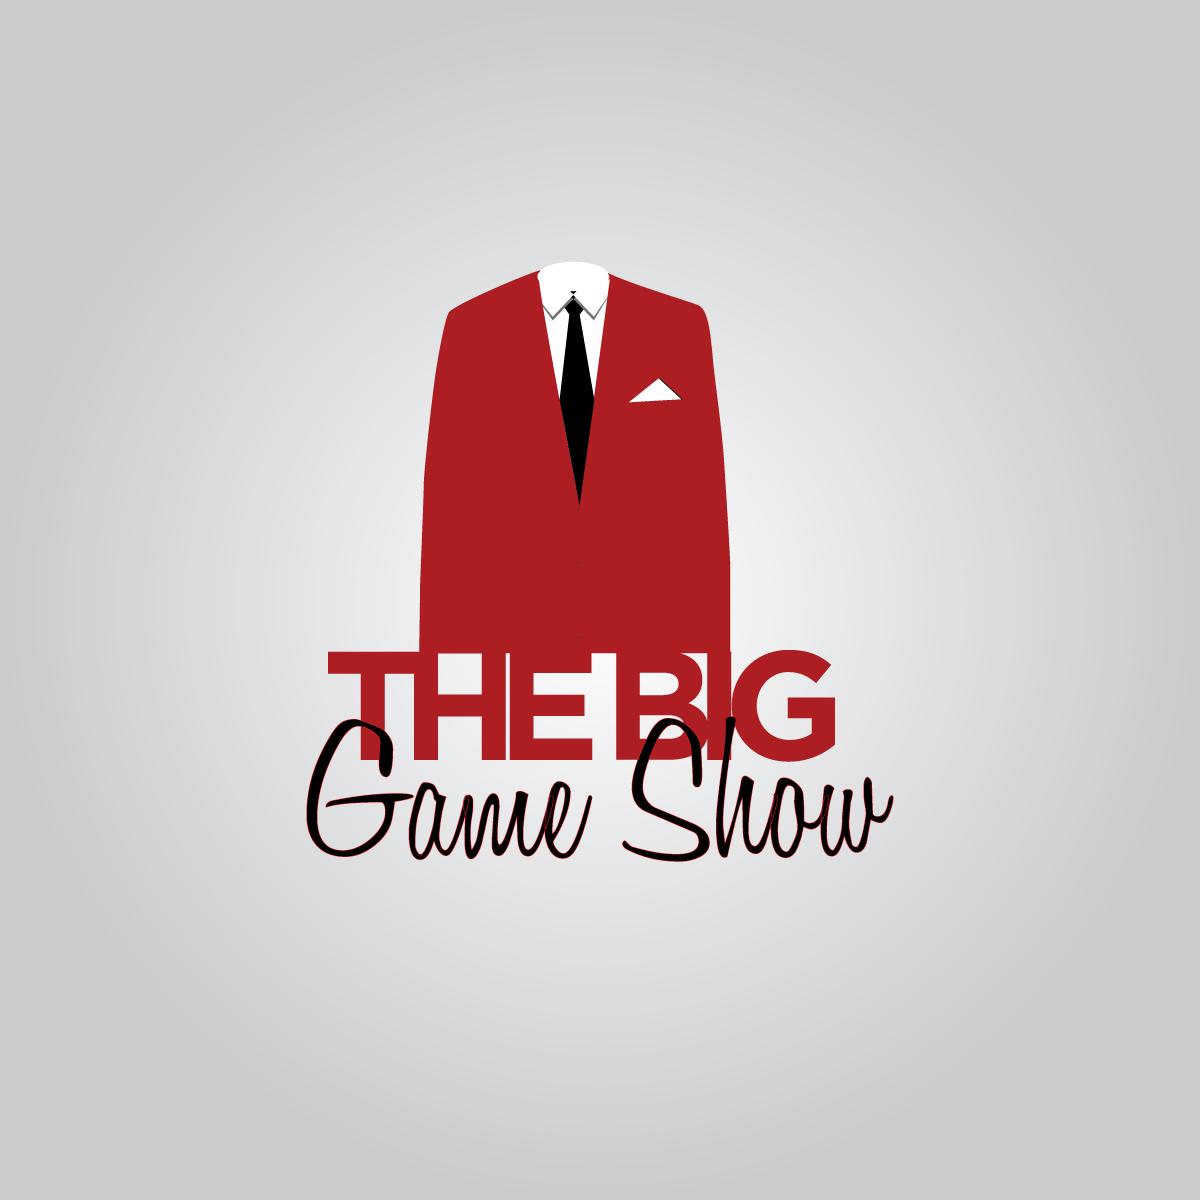 Logo Design by dottDesign - Entry No. 2 in the Logo Design Contest The Big Game Show logo.